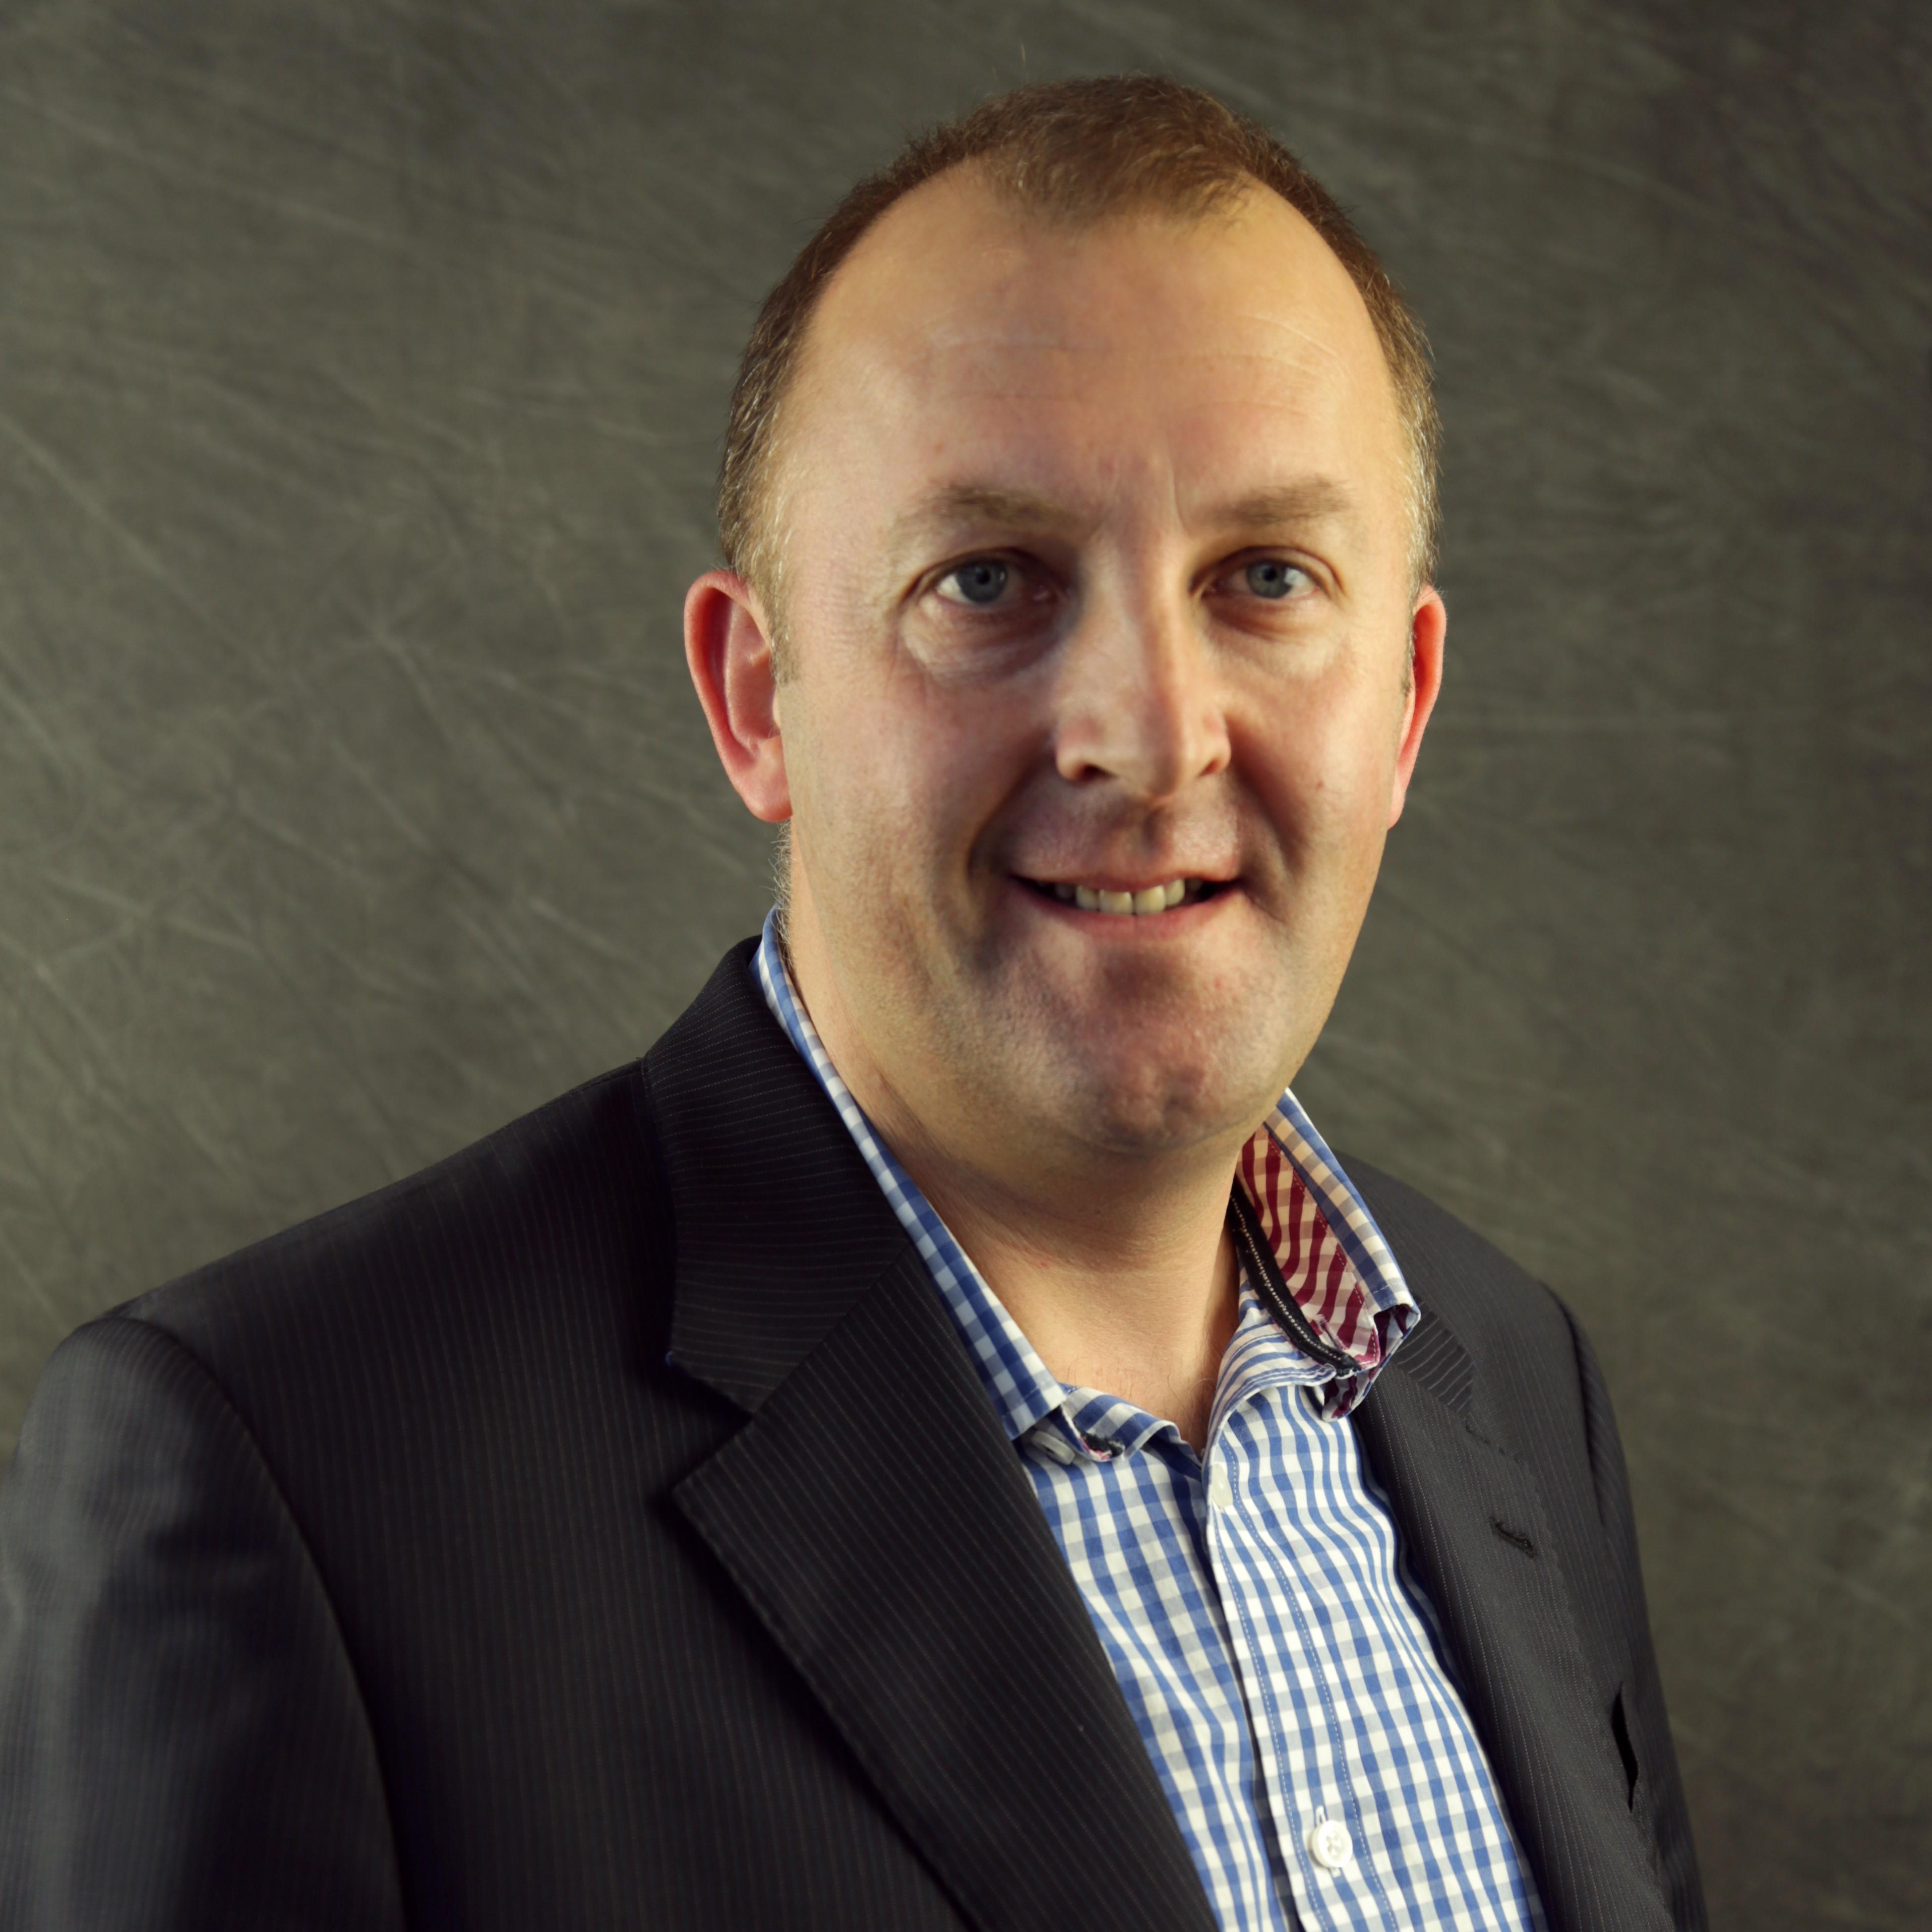 Ian Bransdon